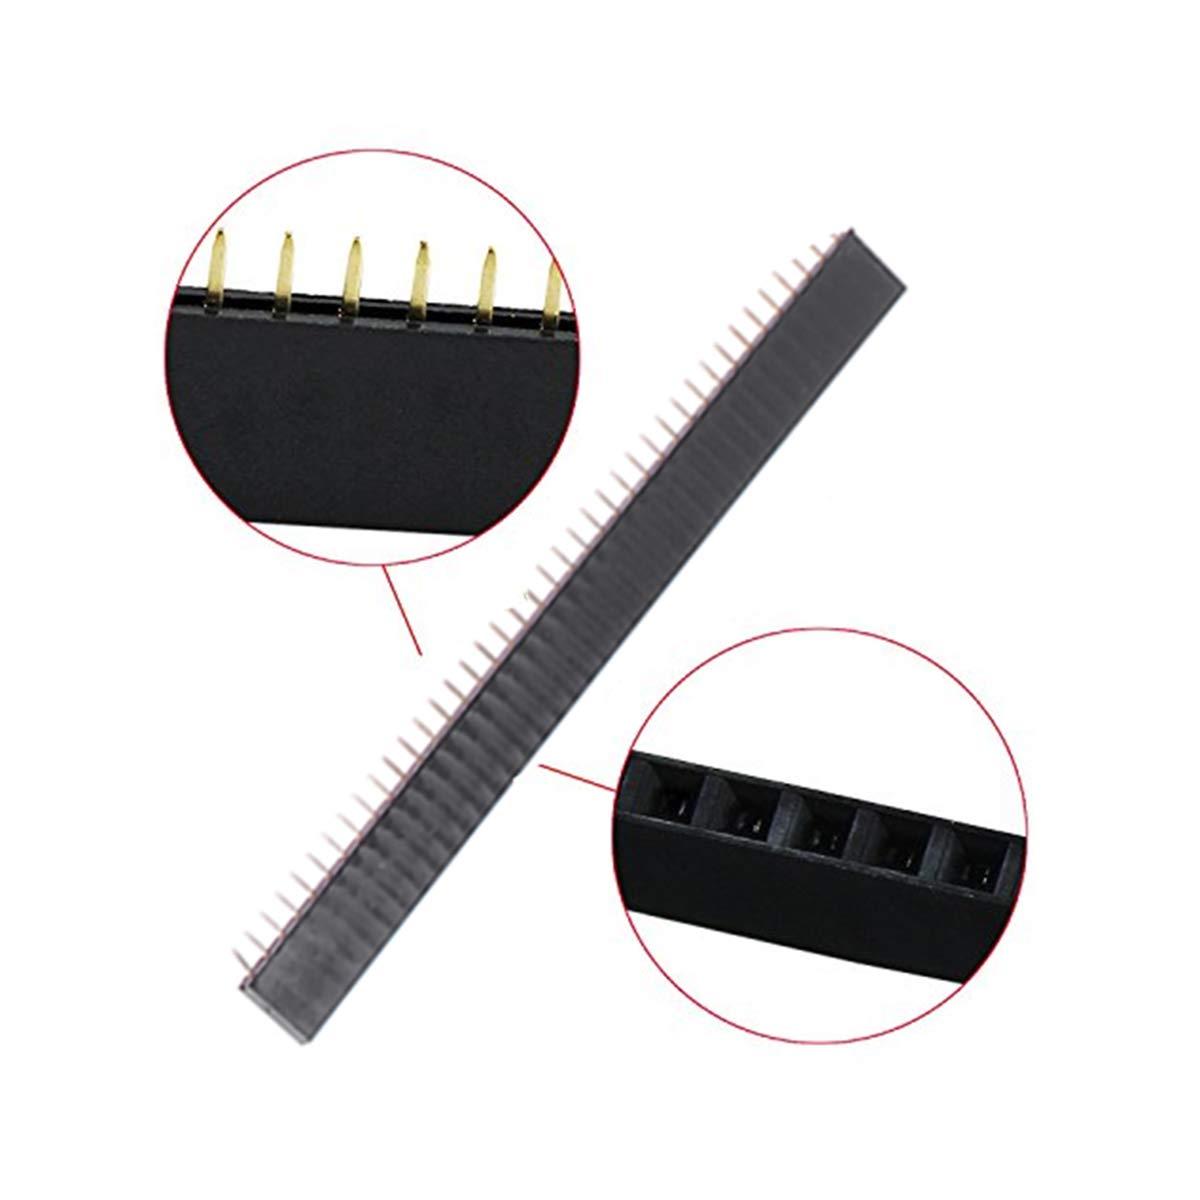 Hemobllo 20 unids 2.54mm de Una Sola Fila 40Pin 2.54mm Pin Pin Header Conector Escape PCB Placa para Arduino Shield